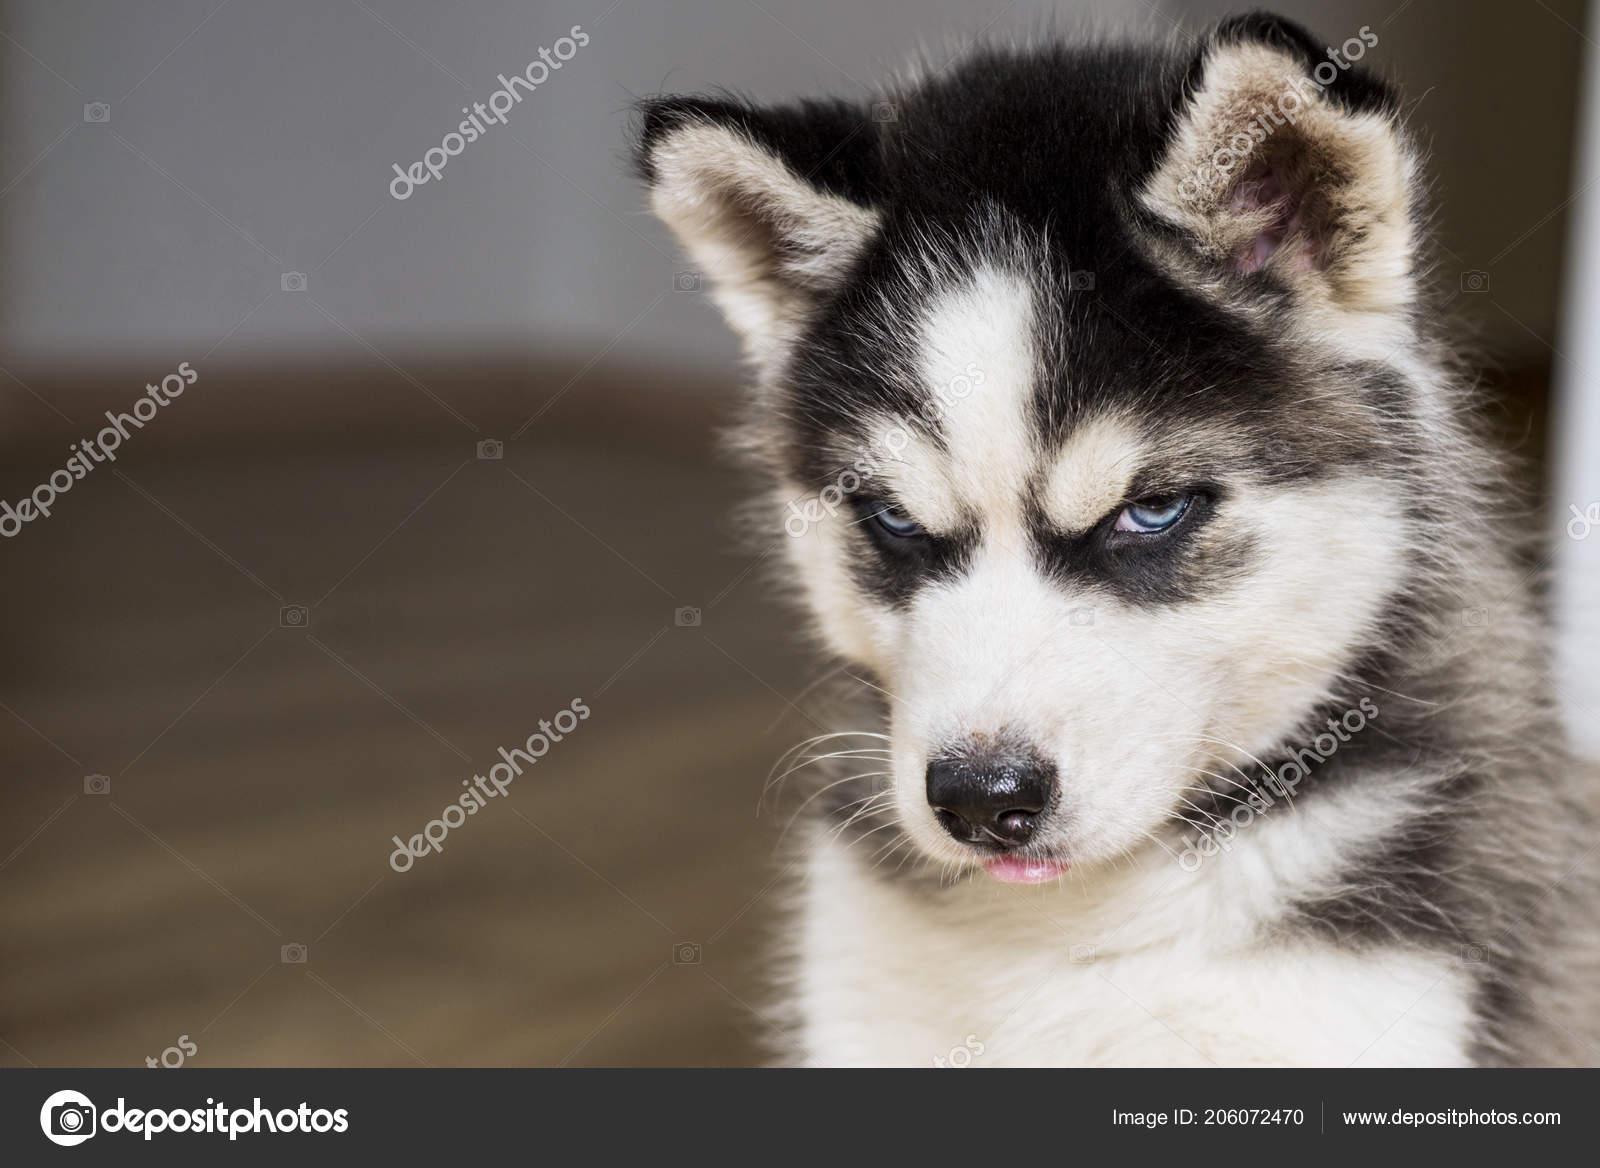 Cutest Husky Puppies For Sale Cute Little Siberian Husky Puppy Blue Eyed Siberian Husky Puppy Stock Photo C Spyrakot 206072470